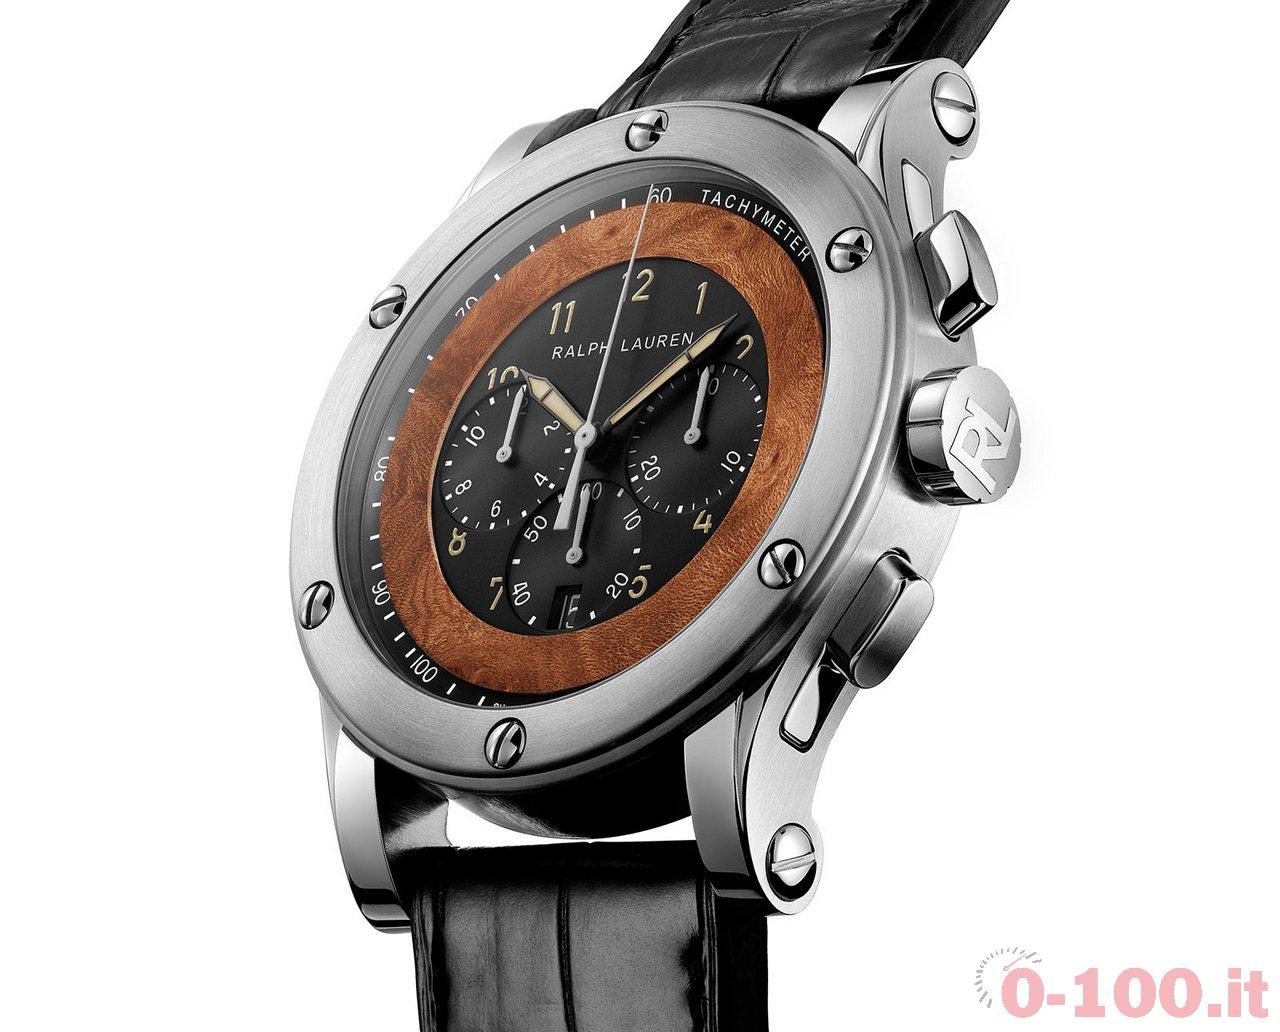 anteprima-sihh-2015-ralph-lauren-automotive-chronograph-prezzo-price-0-100_3